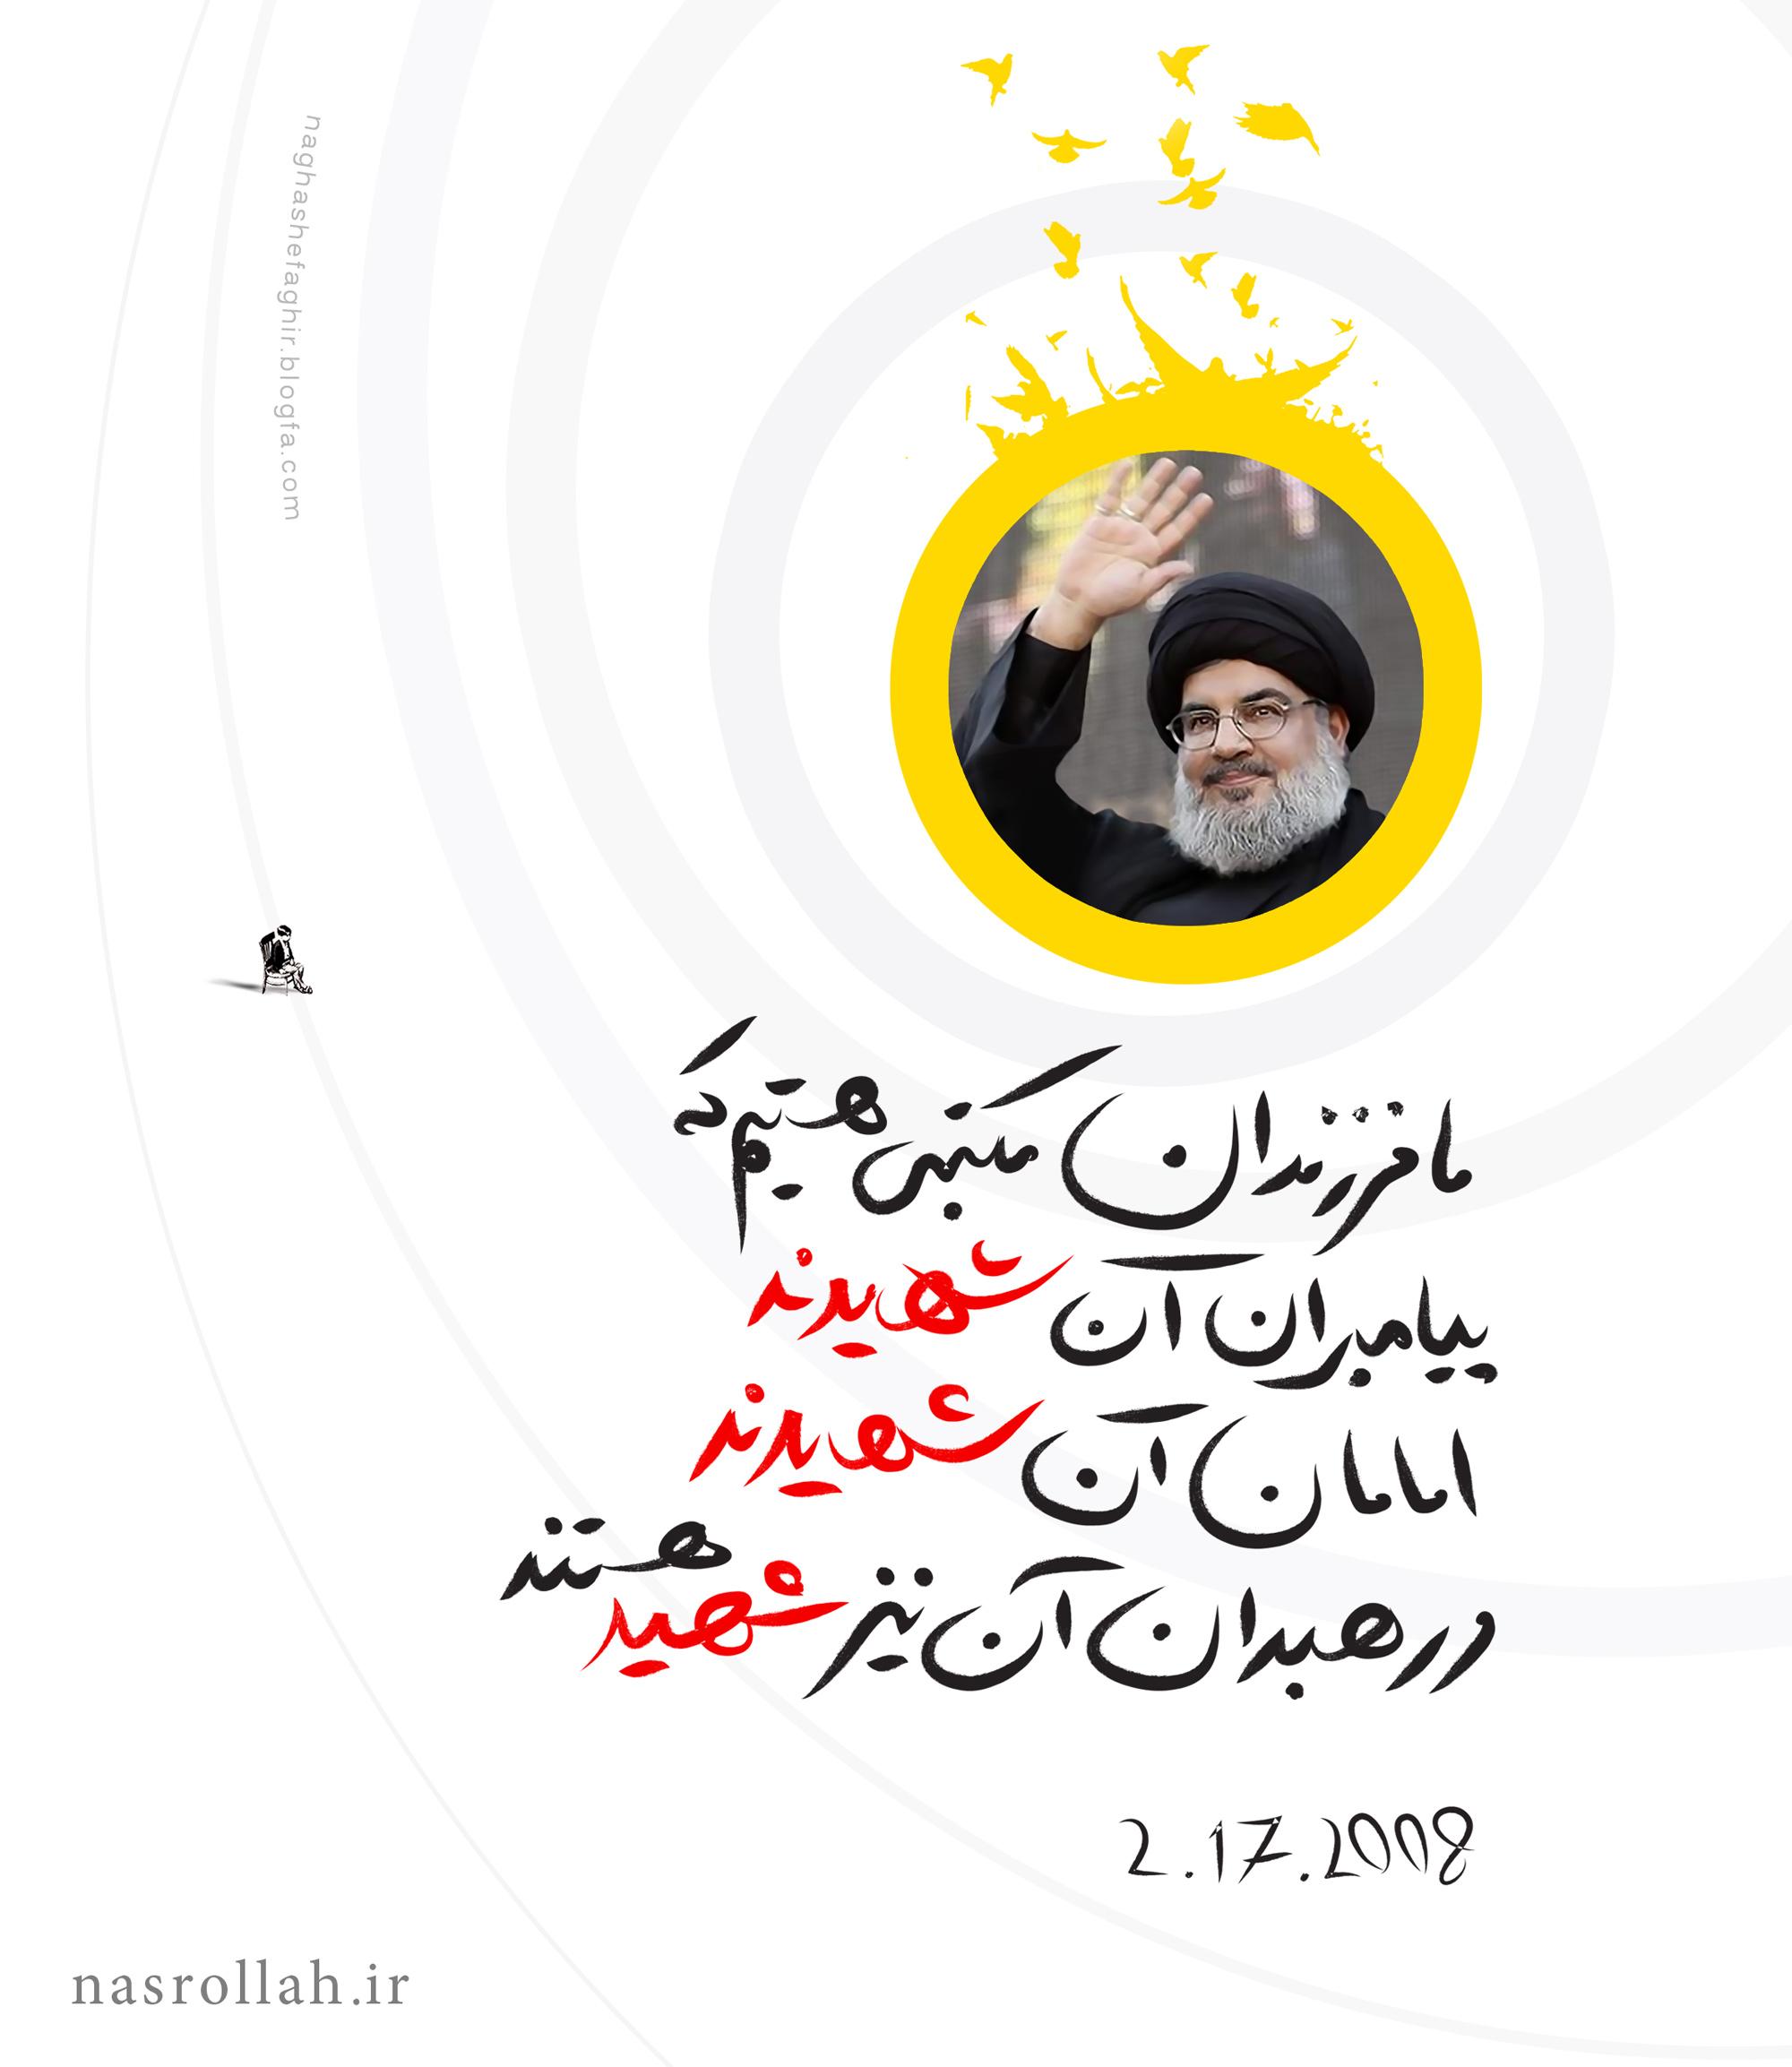 http://naqhashefaghir.persiangig.com/image/9/105-nasrollah-High.jpg